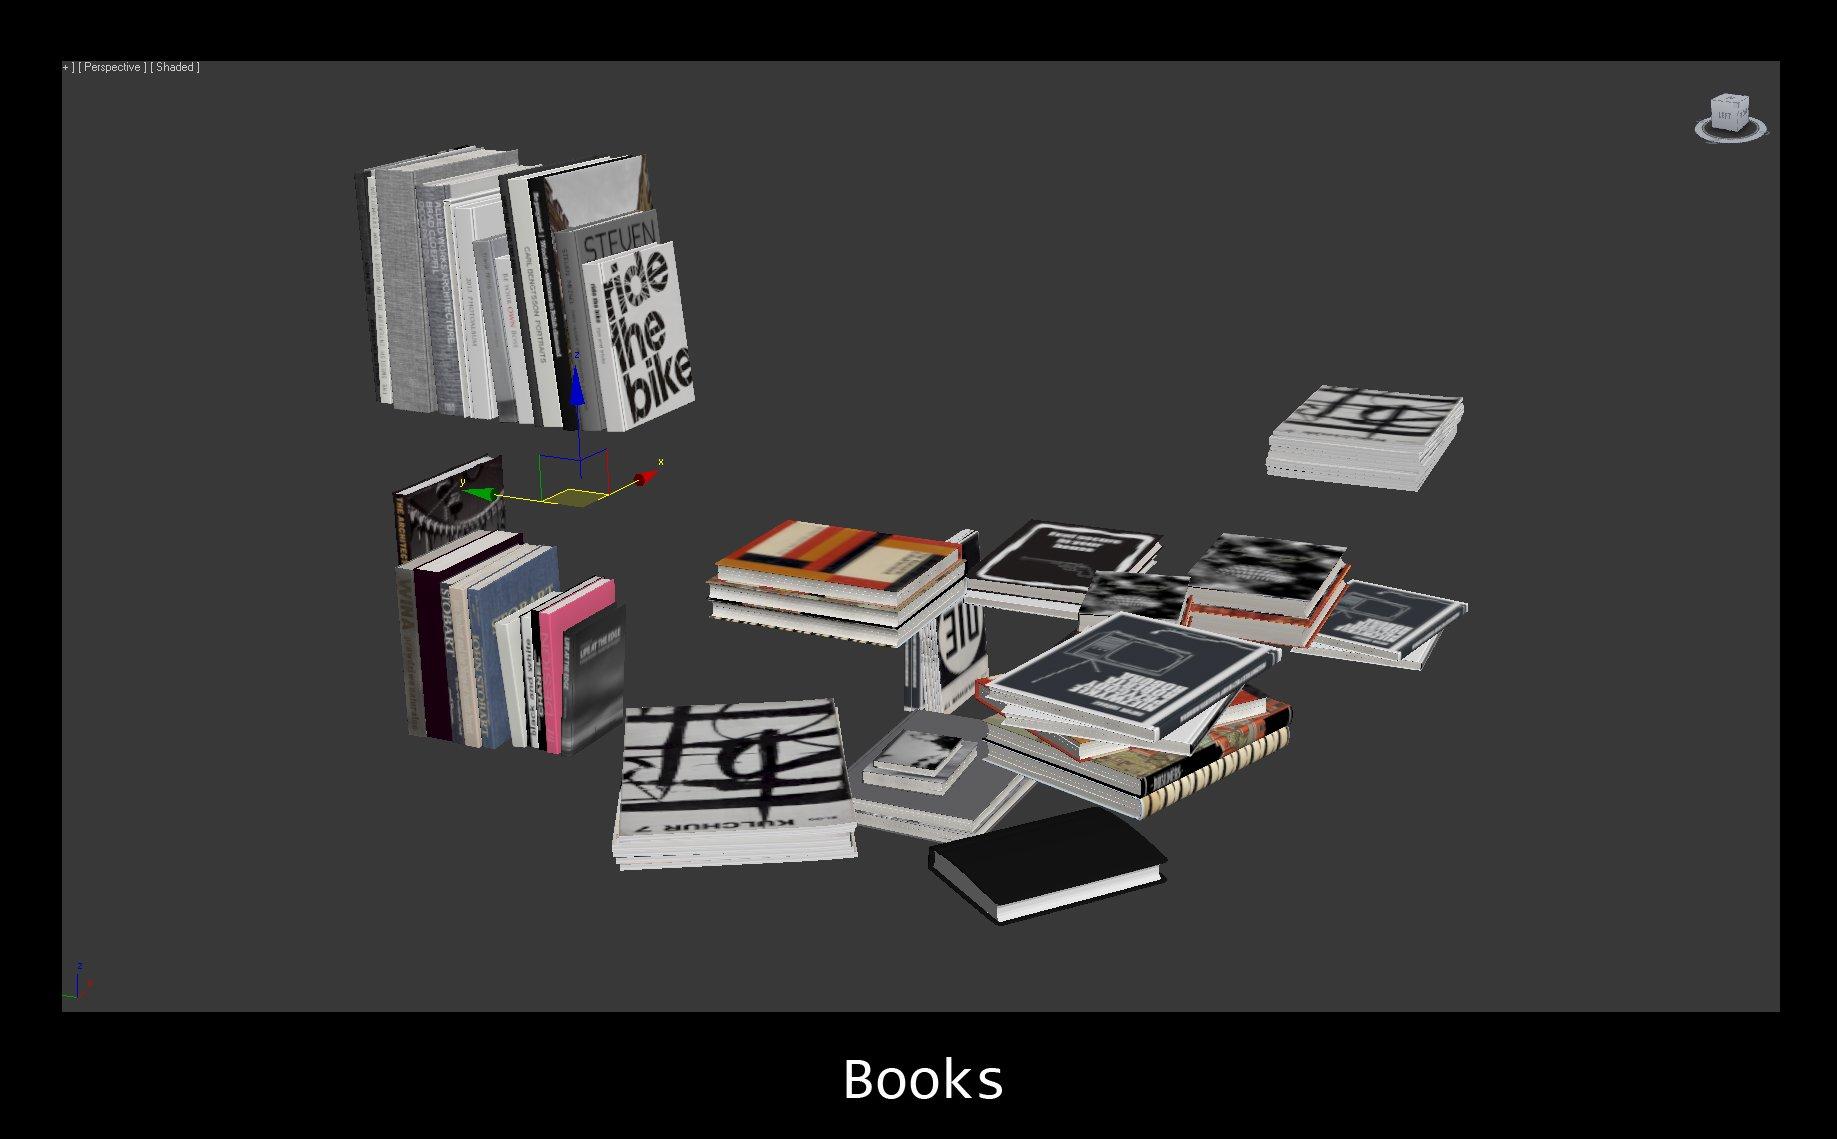 16_Books_evermotion.jpg